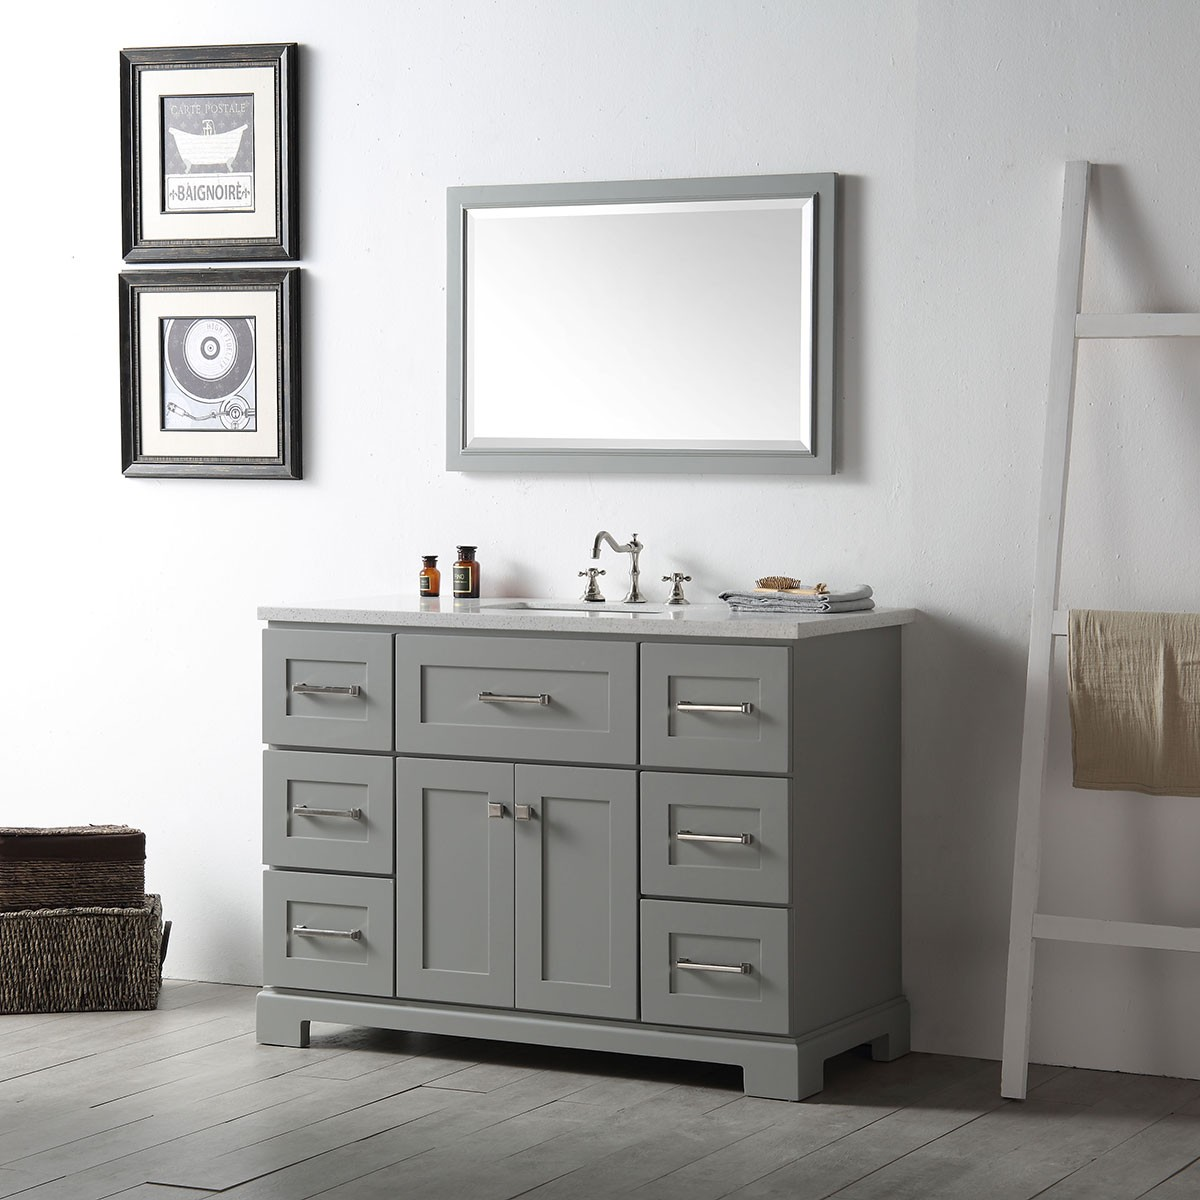 48 in bathroom vanity set without mirror dk 6648 cg